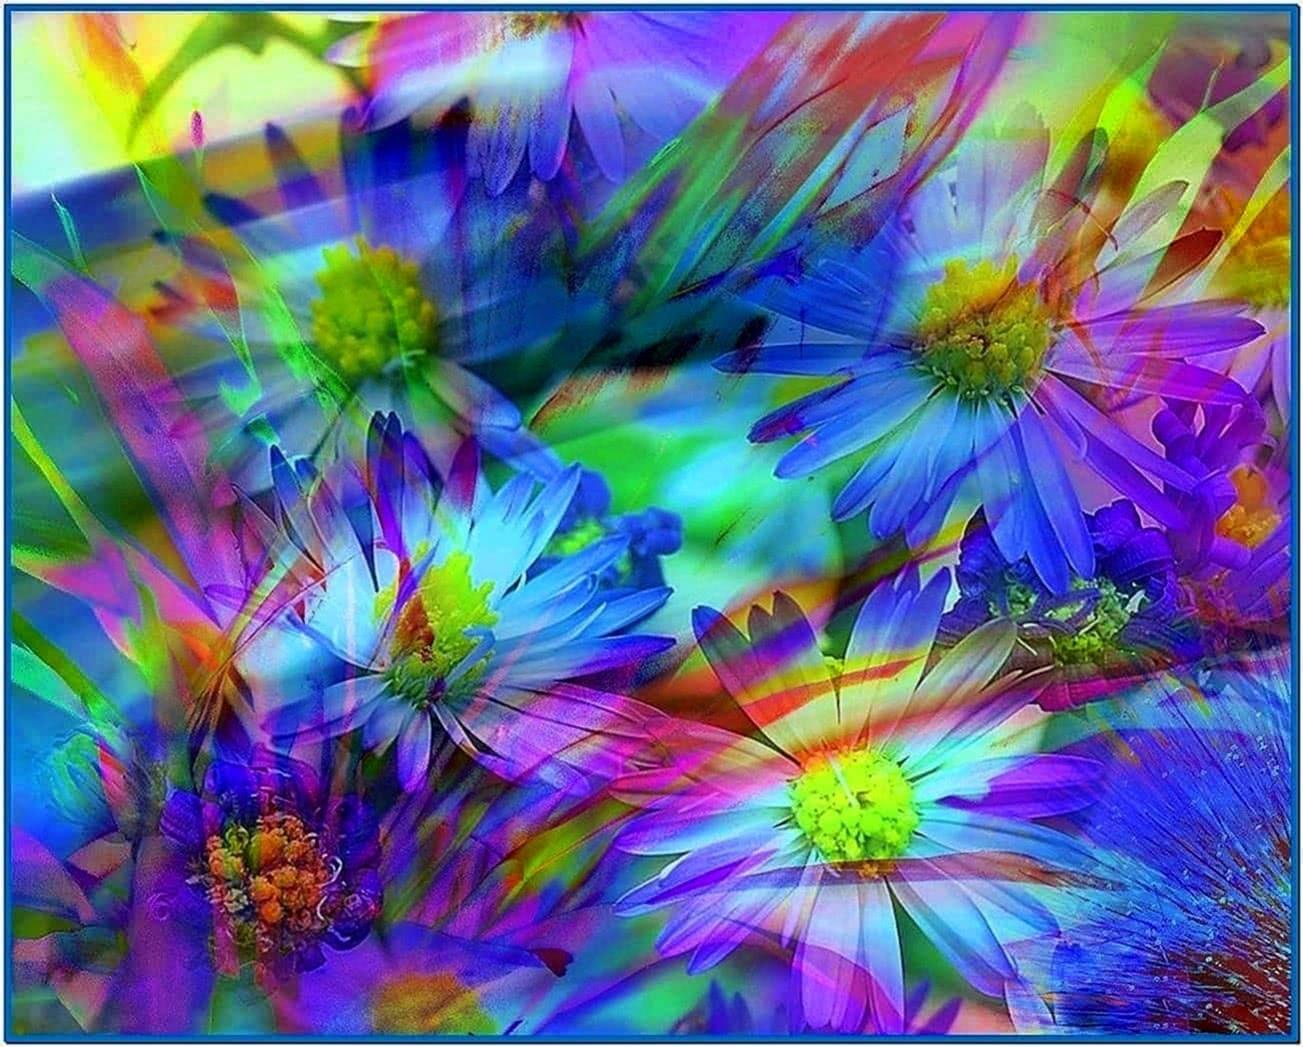 spring flowers screensavers - photo #35